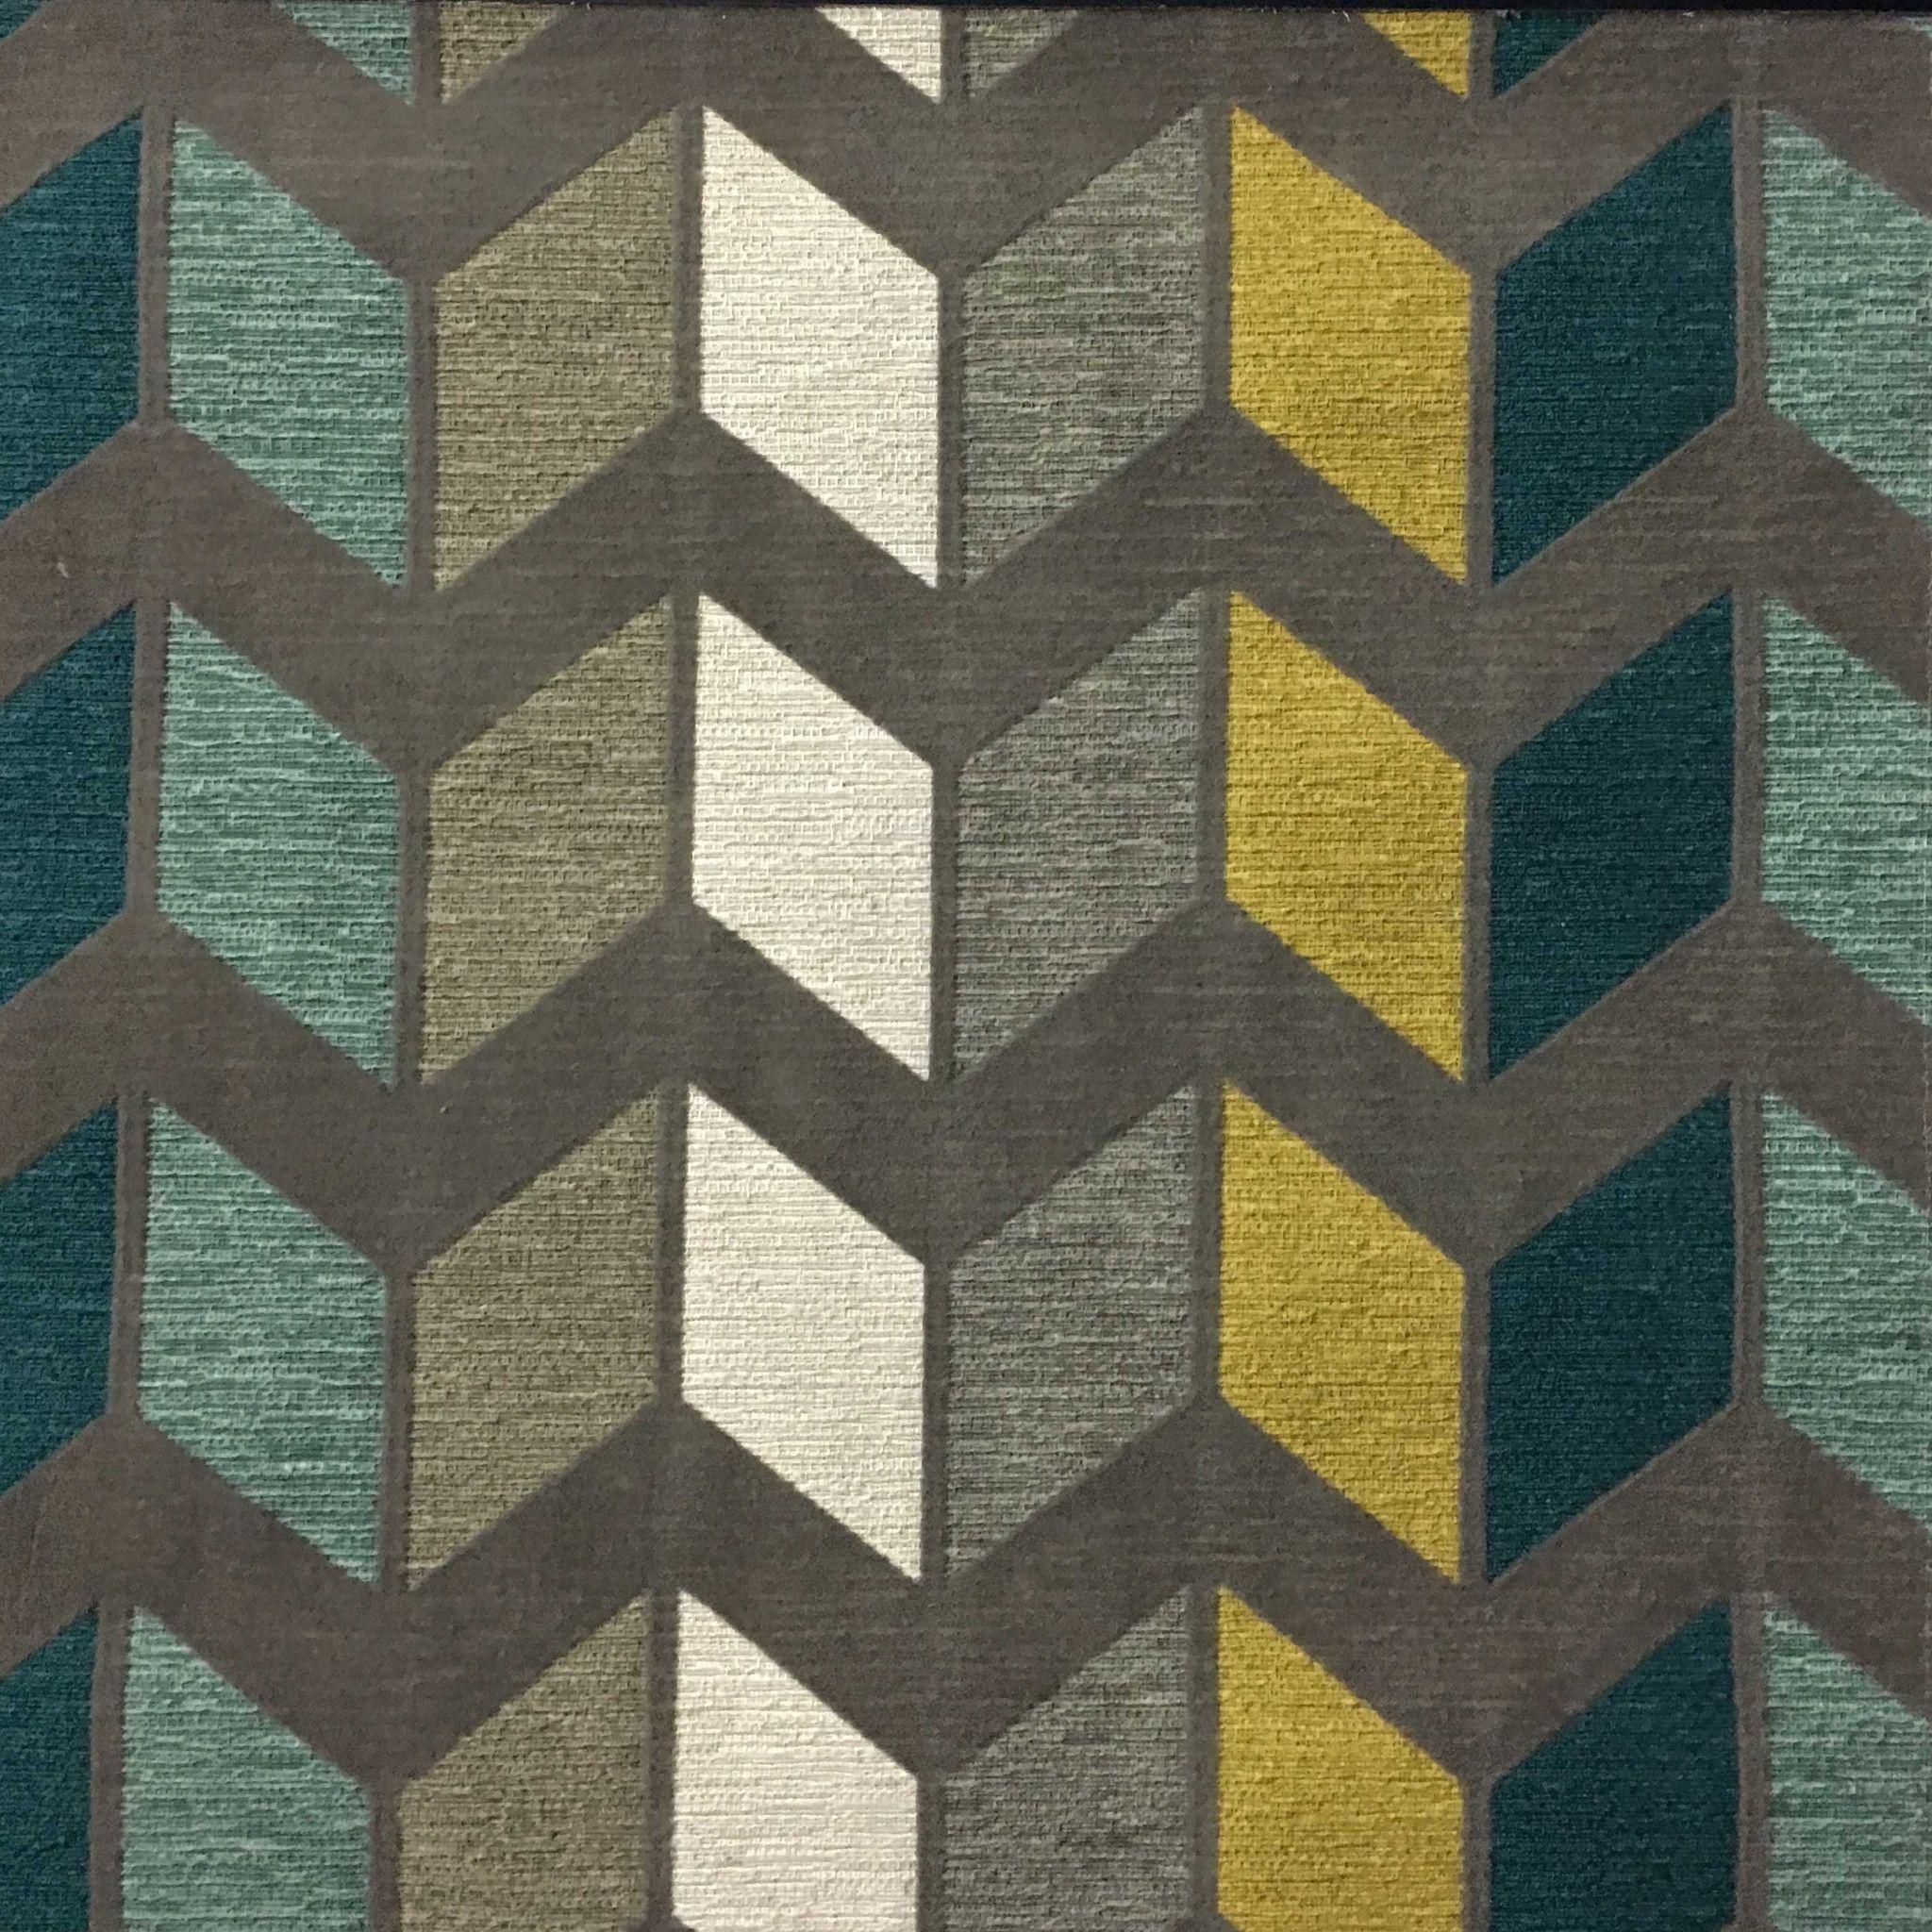 Ziba Modern Texture Chevron Pattern Cotton Polyester Blend